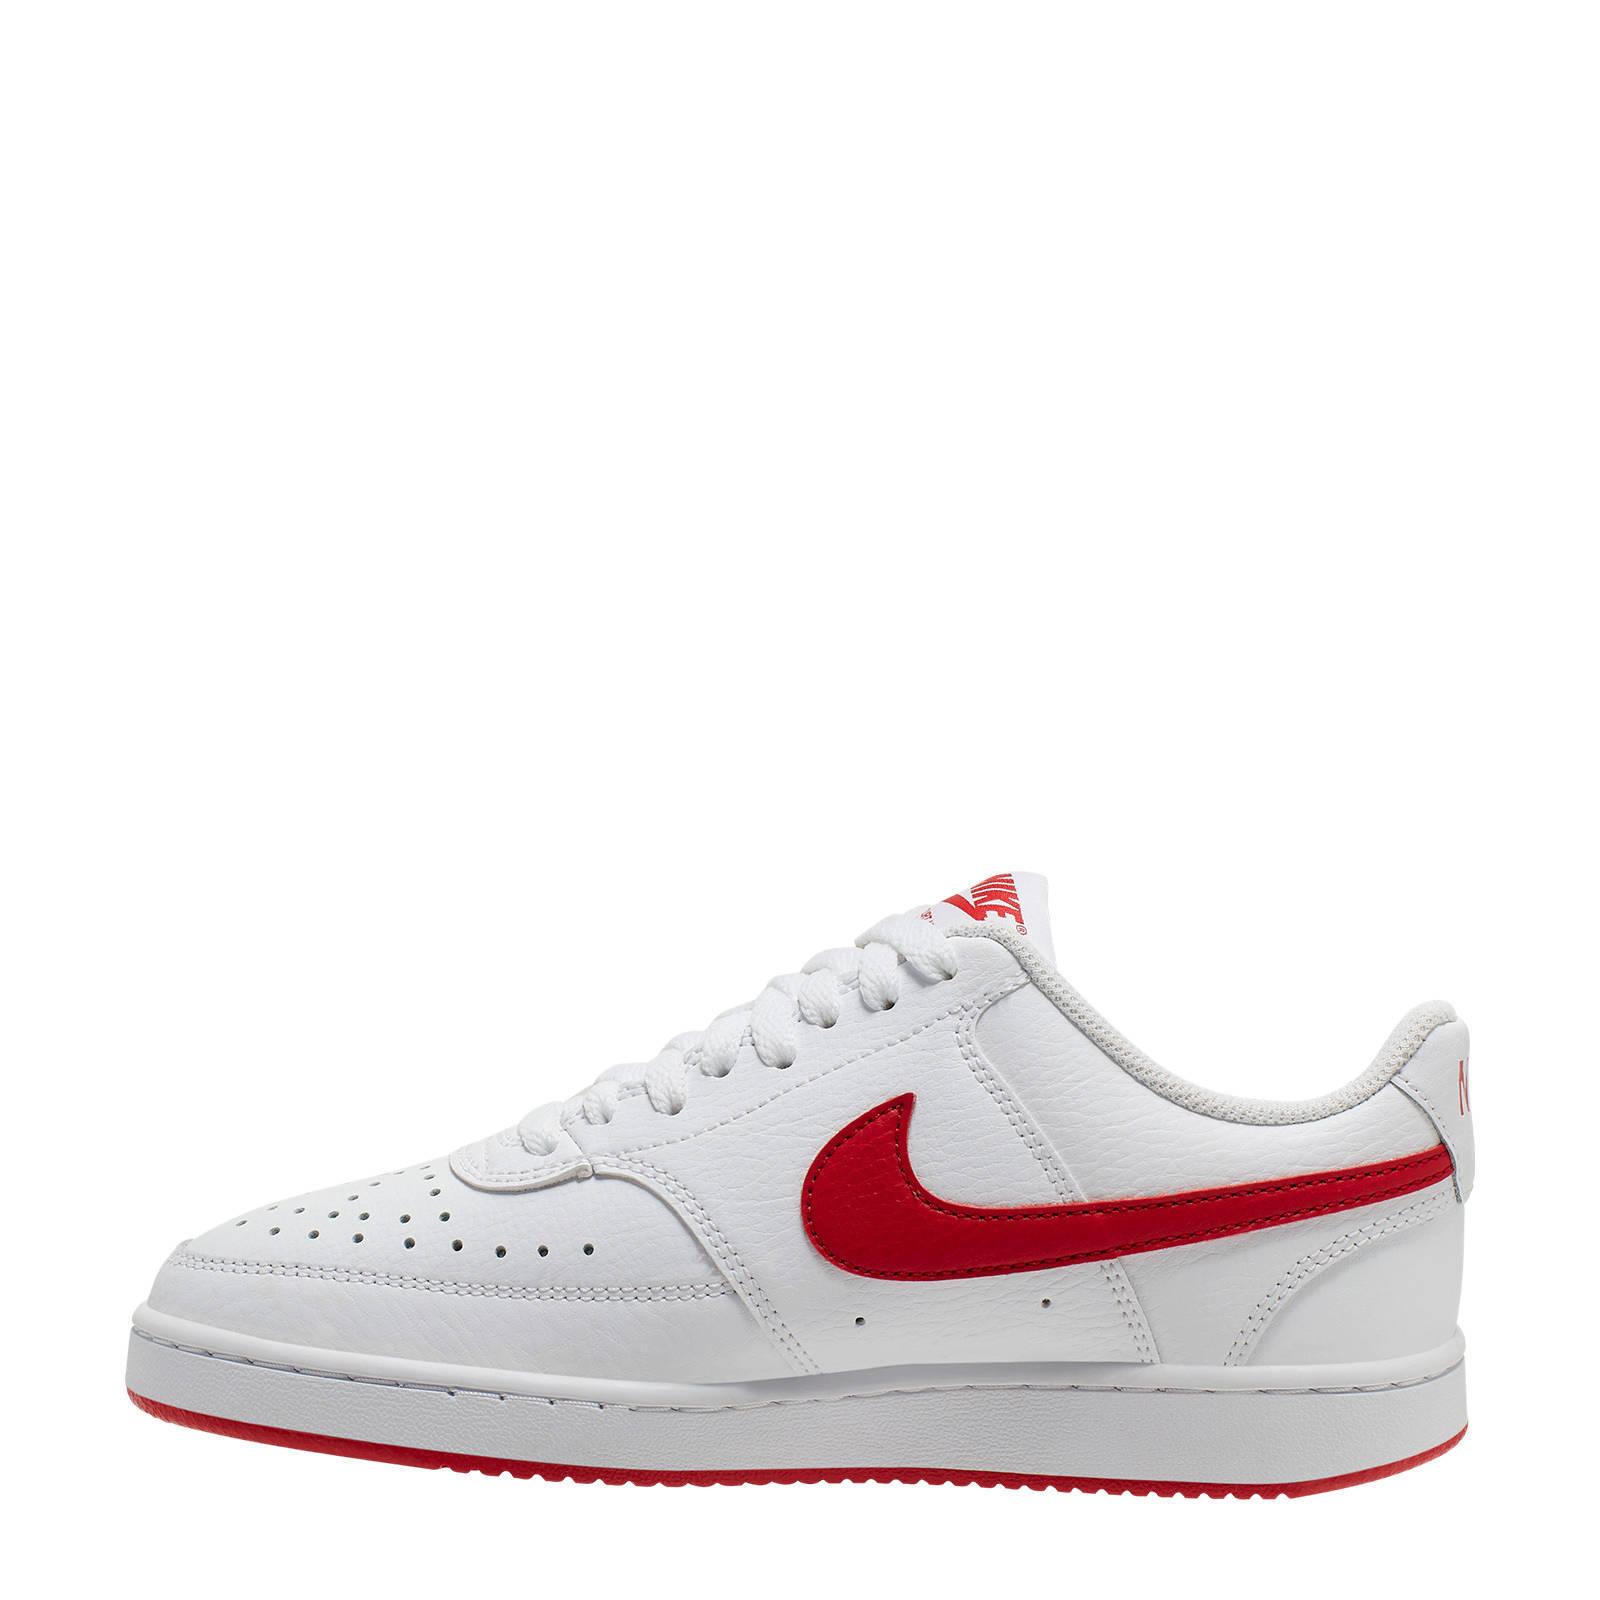 Nike Court Vision Low leren sneakers witrood | wehkamp